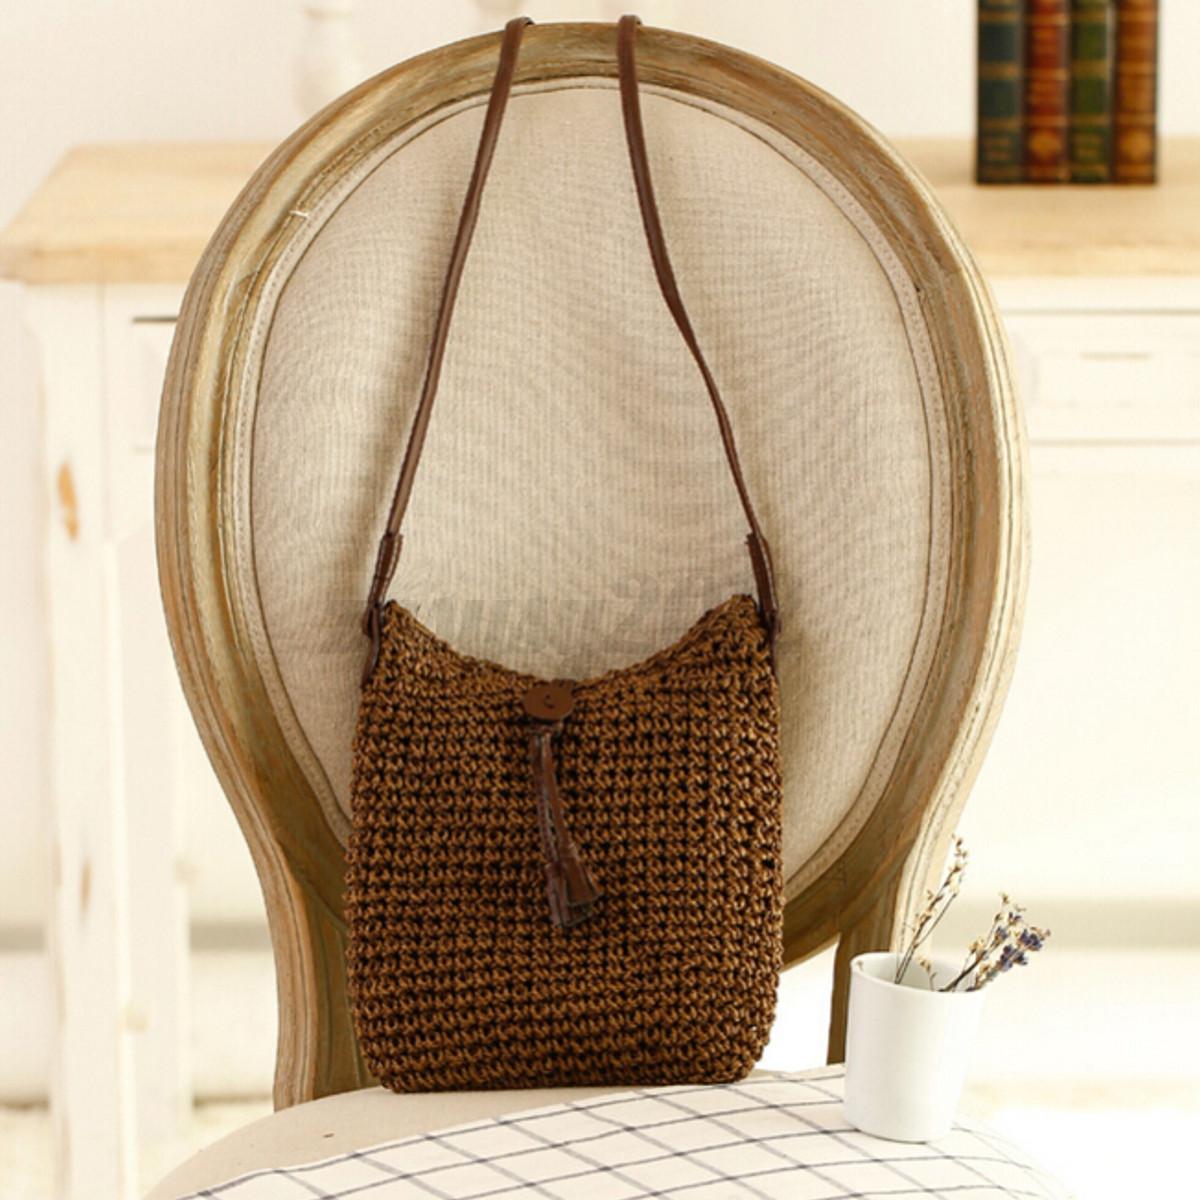 sac main epaule plage boh me pochette cabas paille bandouli re messenger femme ebay. Black Bedroom Furniture Sets. Home Design Ideas